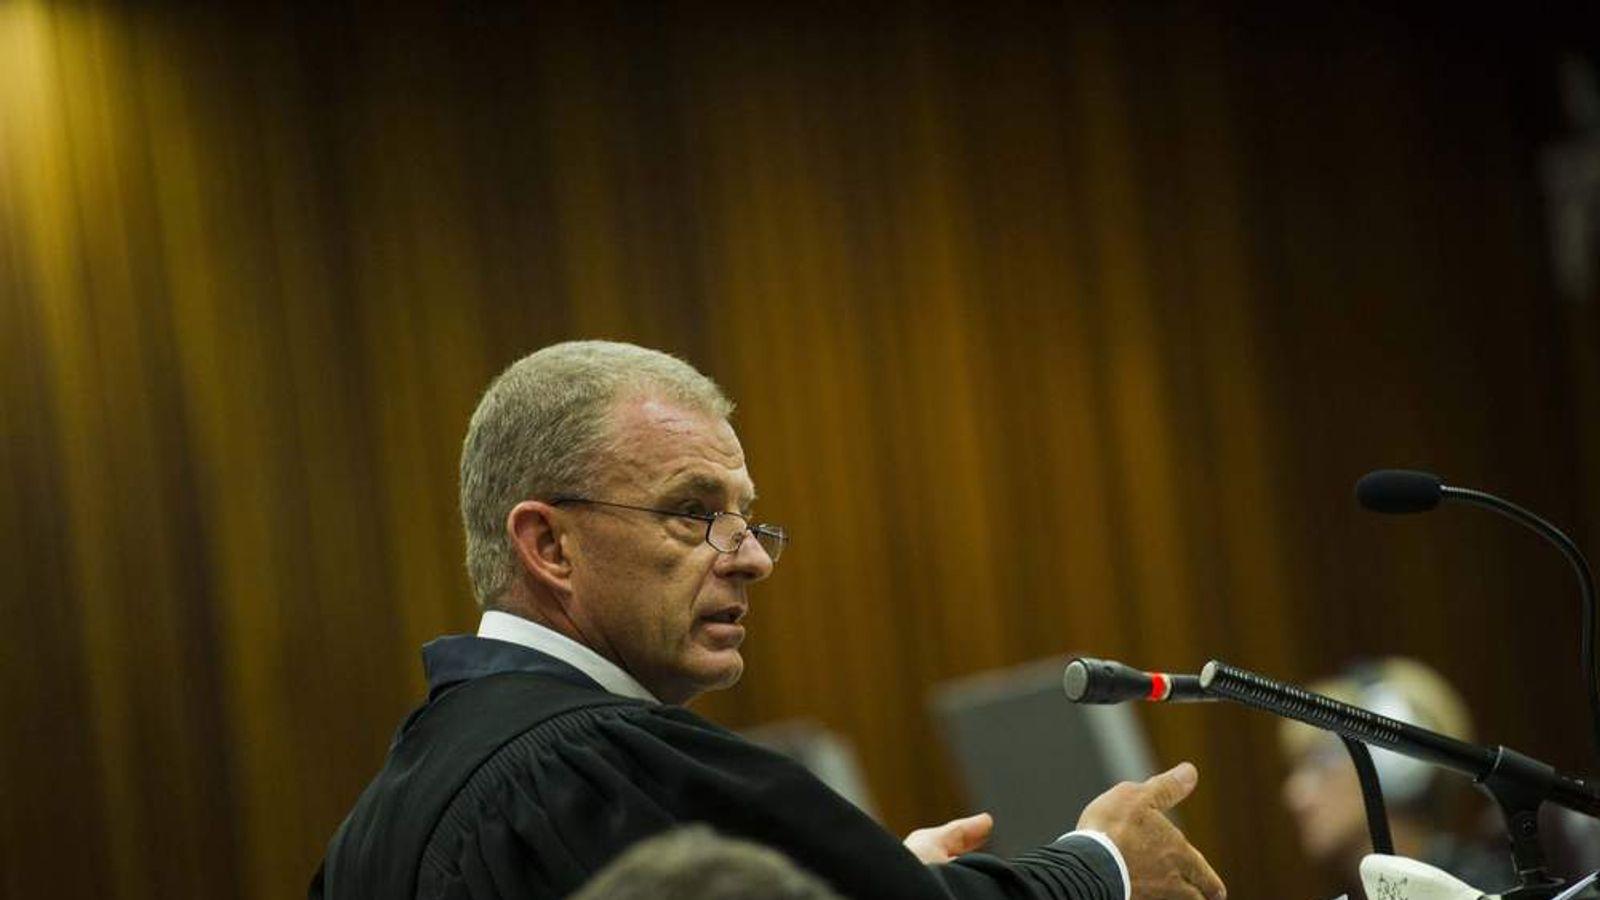 Oscar Pistorius Is Tried For The Murder Of His Girlfriend Reeva Steenkamp